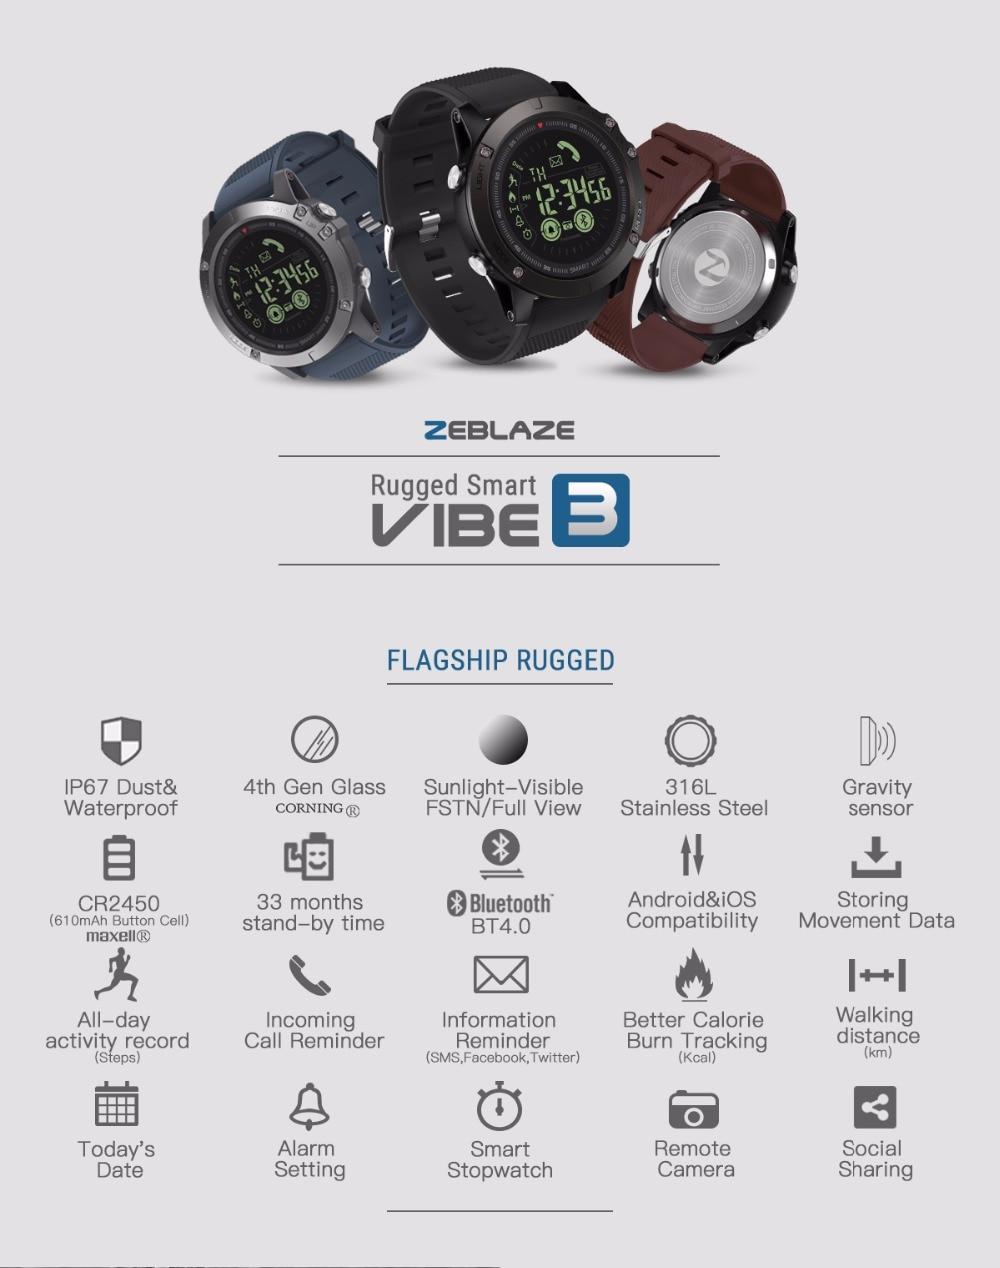 New Zeblaze VIBE 3 Flagship Rugged Smartwatch New Zeblaze VIBE 3 Flagship Rugged Smartwatch HTB1bdNdi8HH8KJjy0Fbq6AqlpXaM